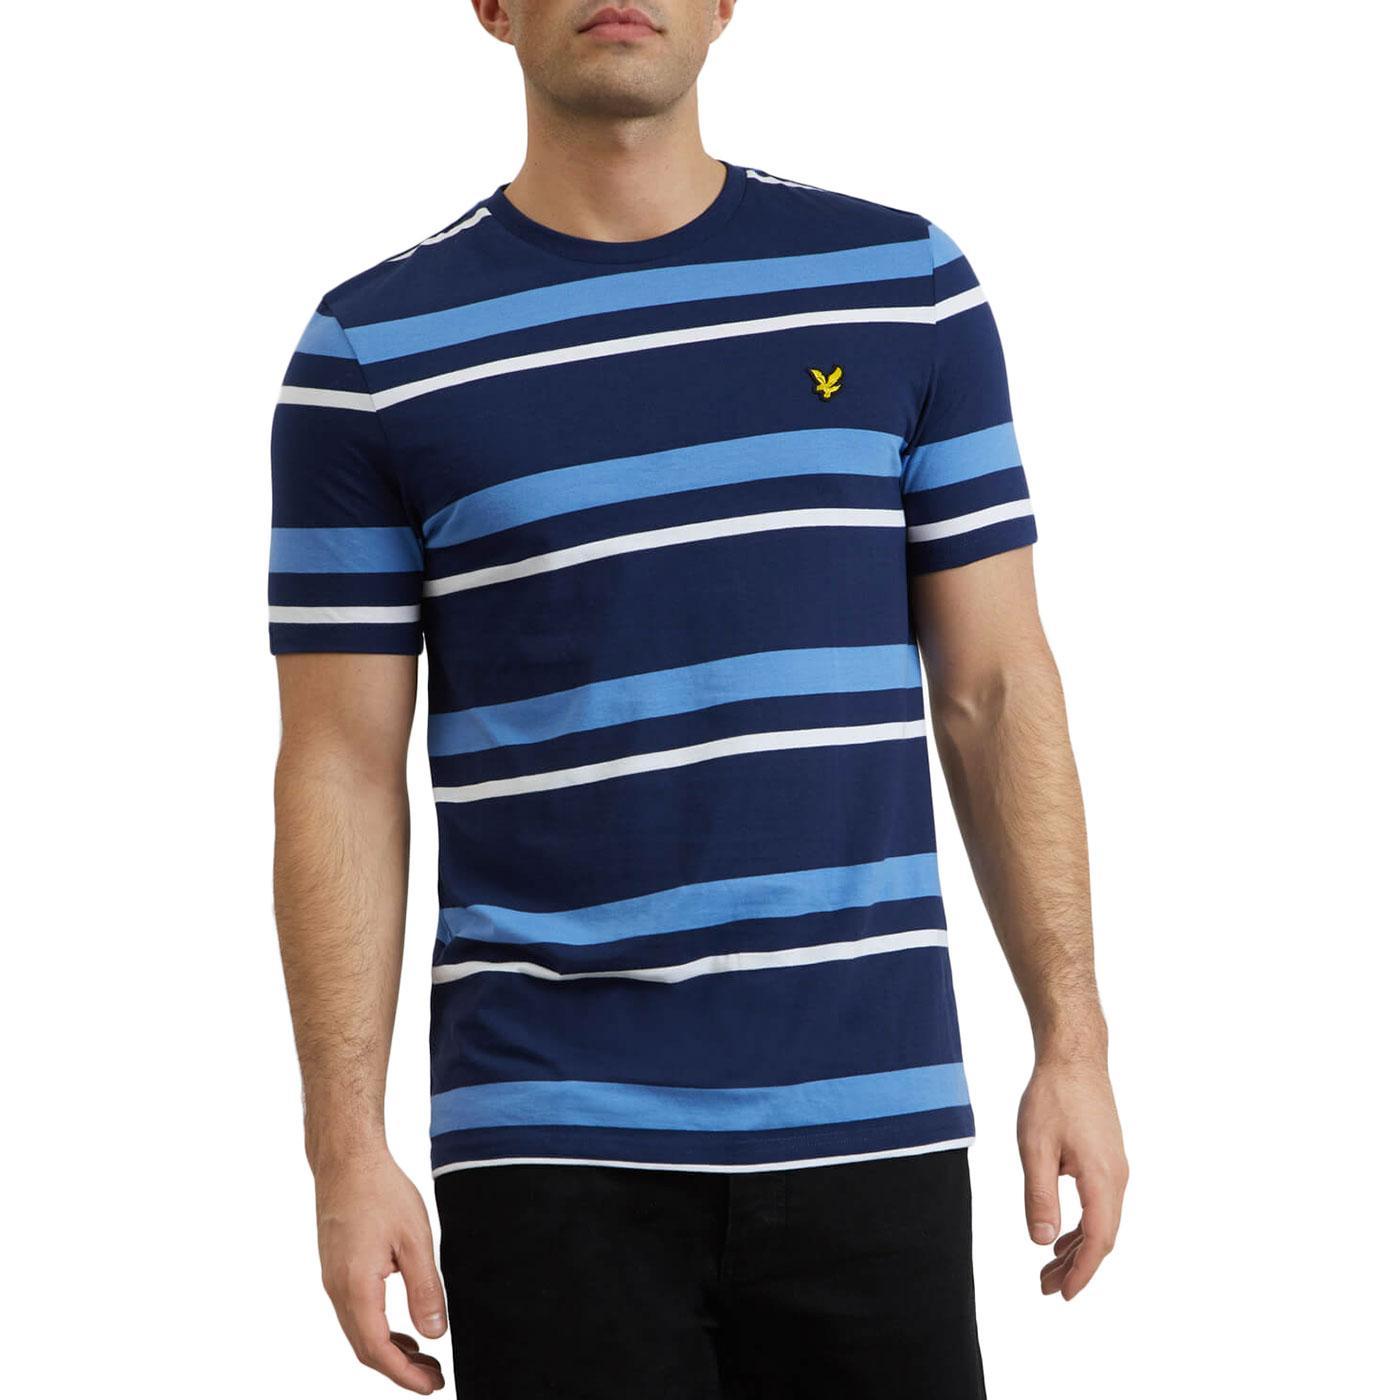 LYLE & SCOTT Retro Mod Multi Stripe T-shirt (Navy)